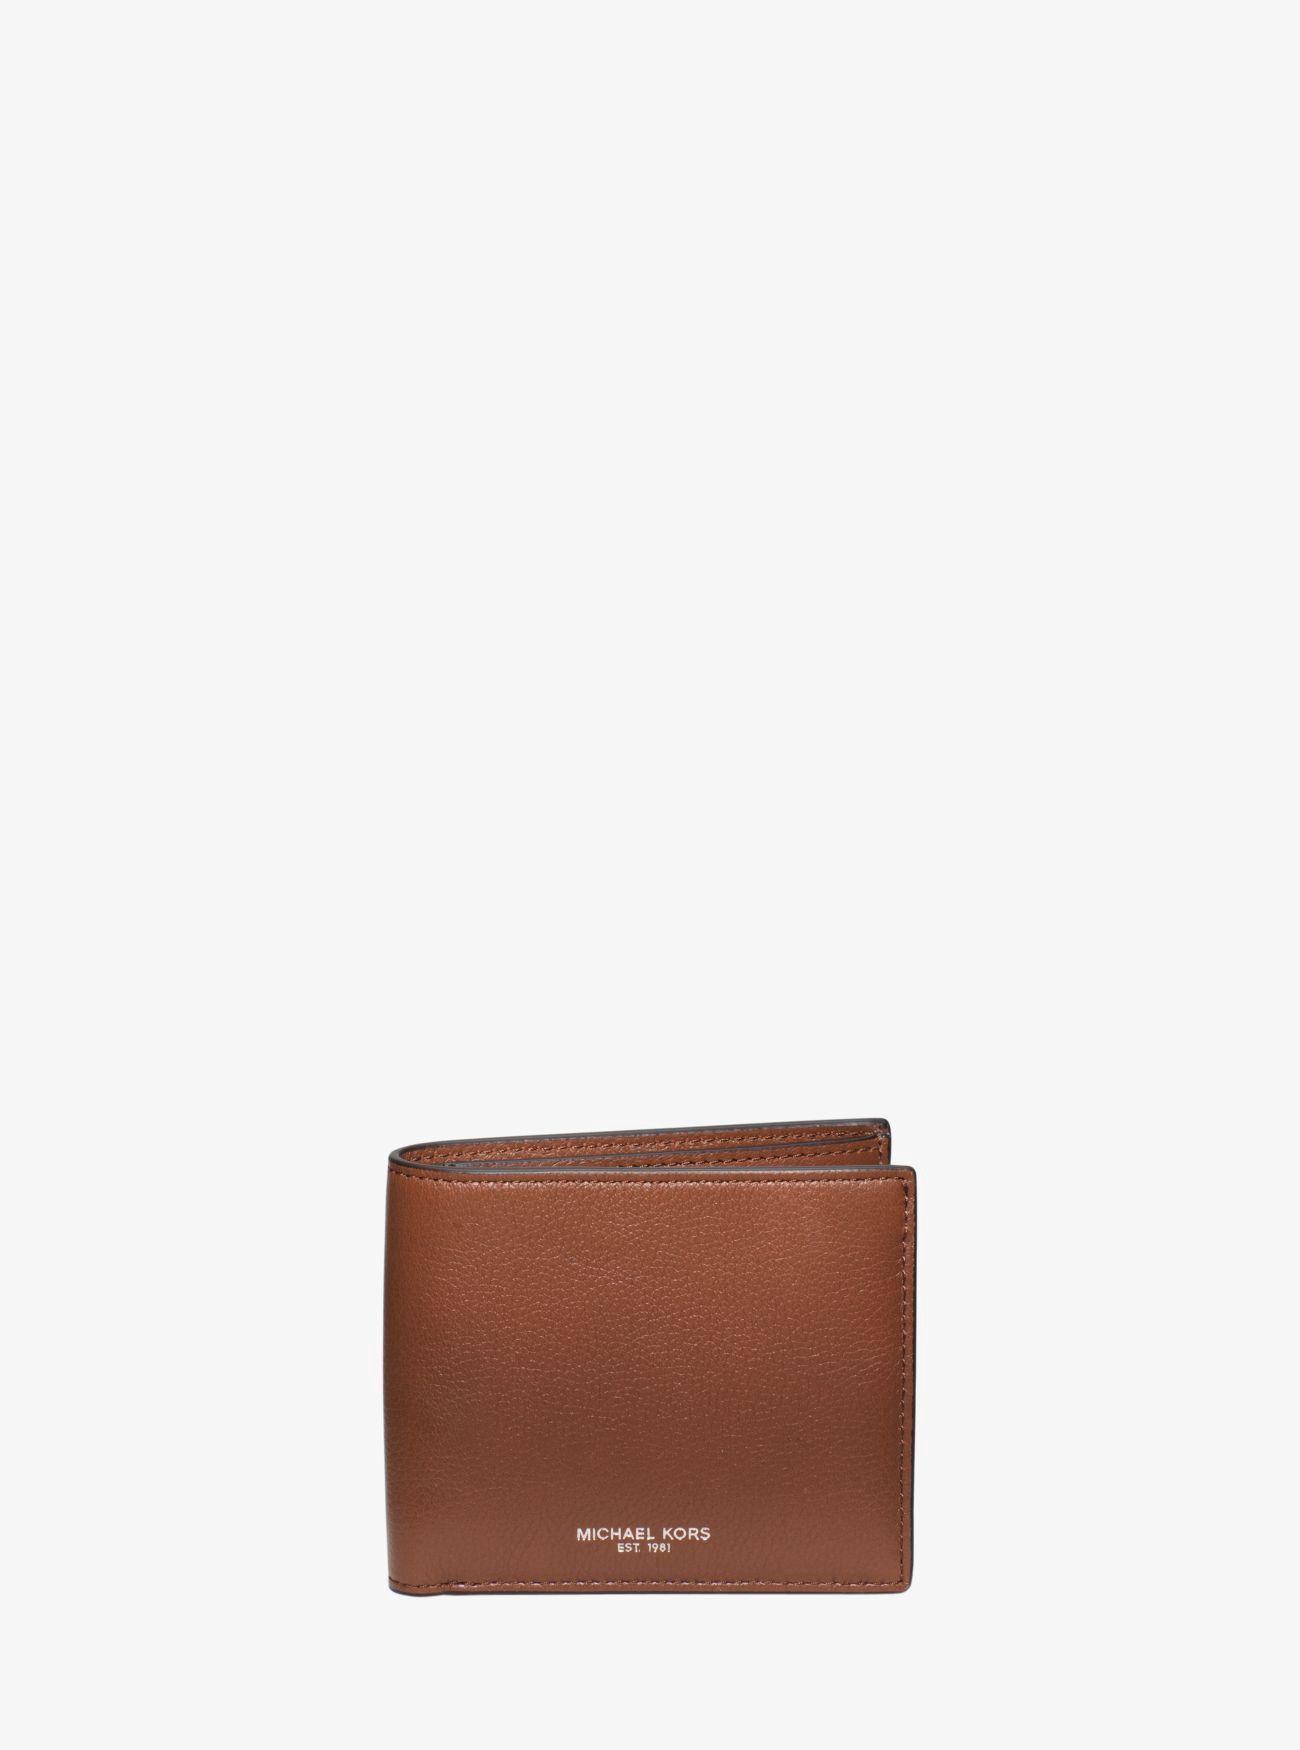 945e44a3245c5e Michael Kors Bryant Leather Billfold Wallet - Luggage Billfold Wallet, Michael  Kors Men, Leather